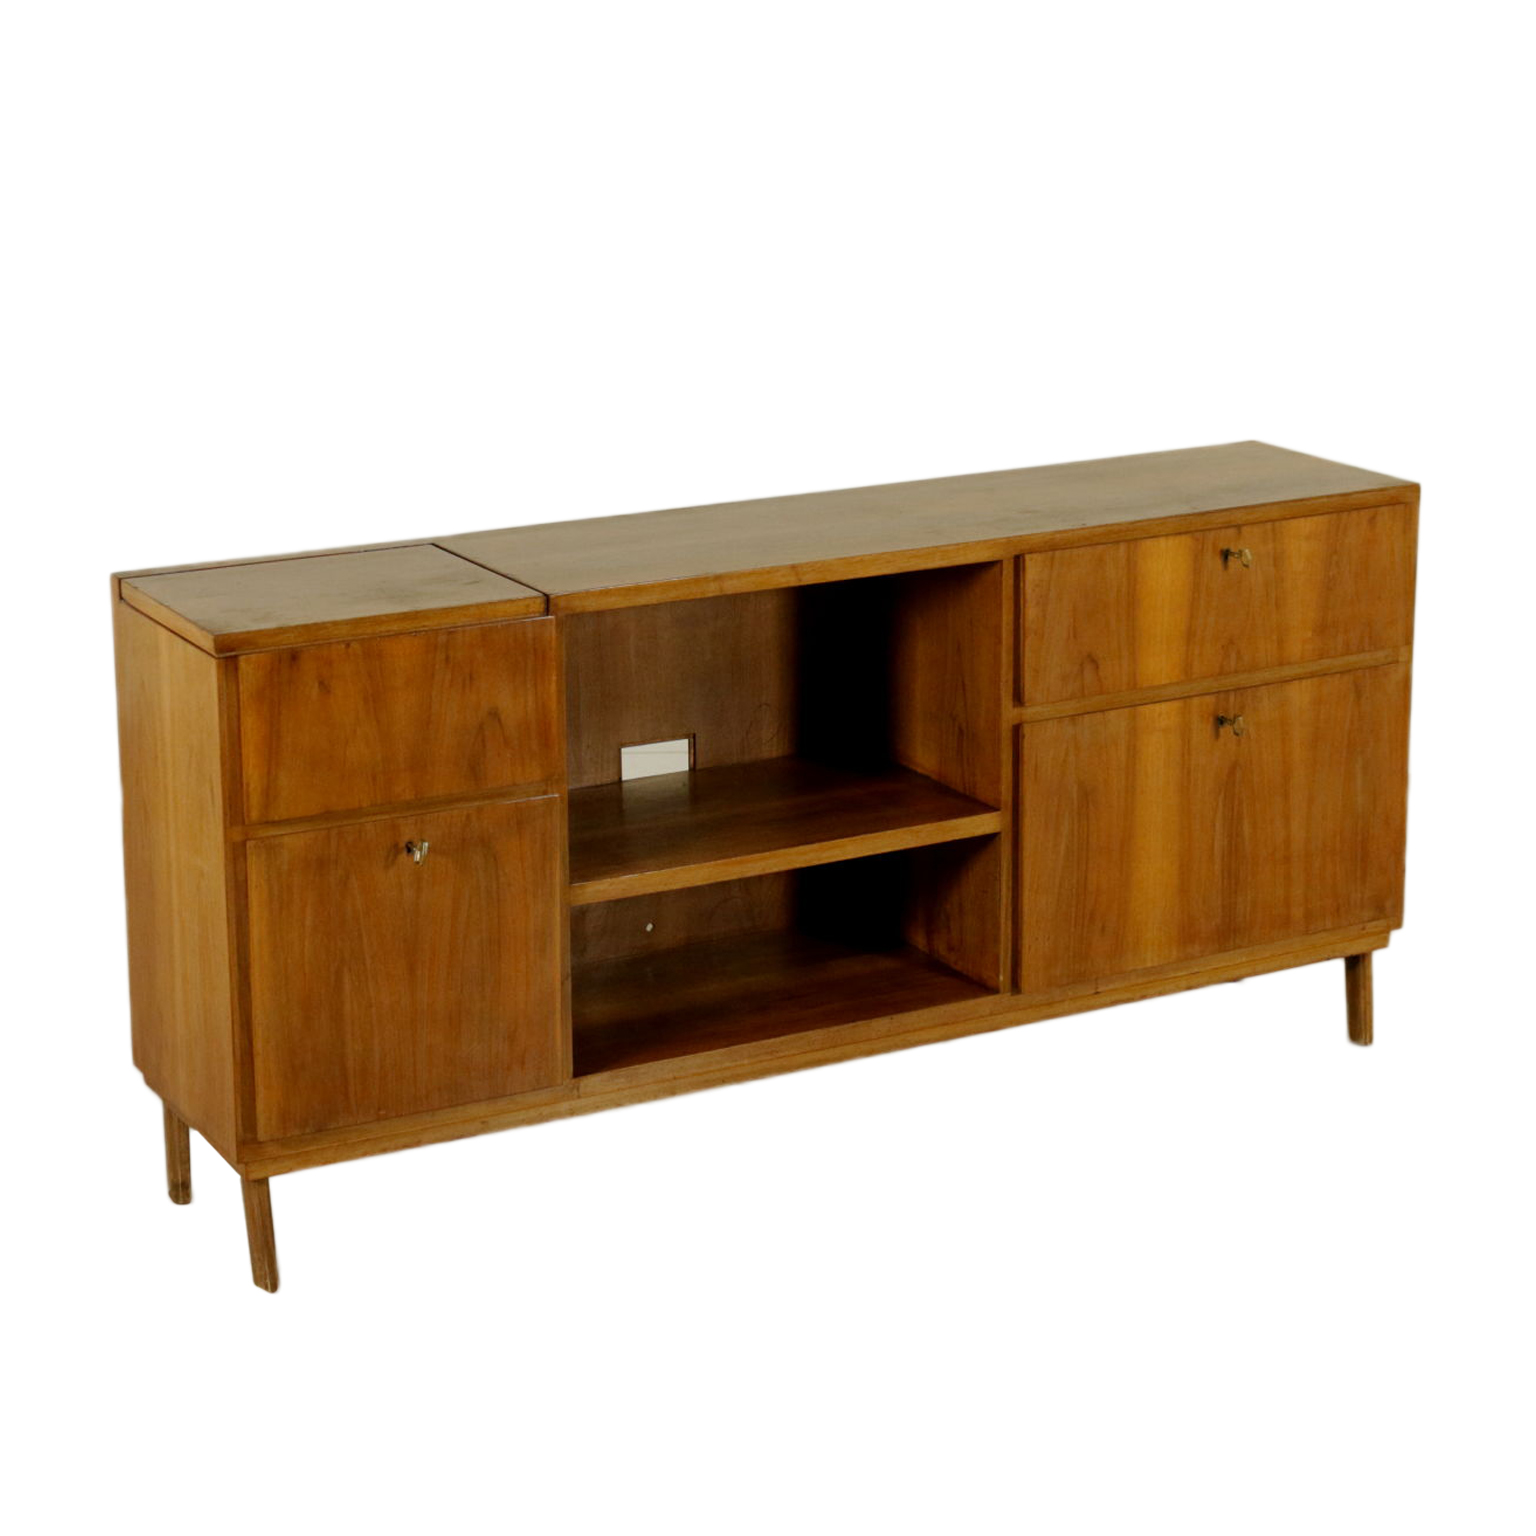 1940s 1950s cupboard